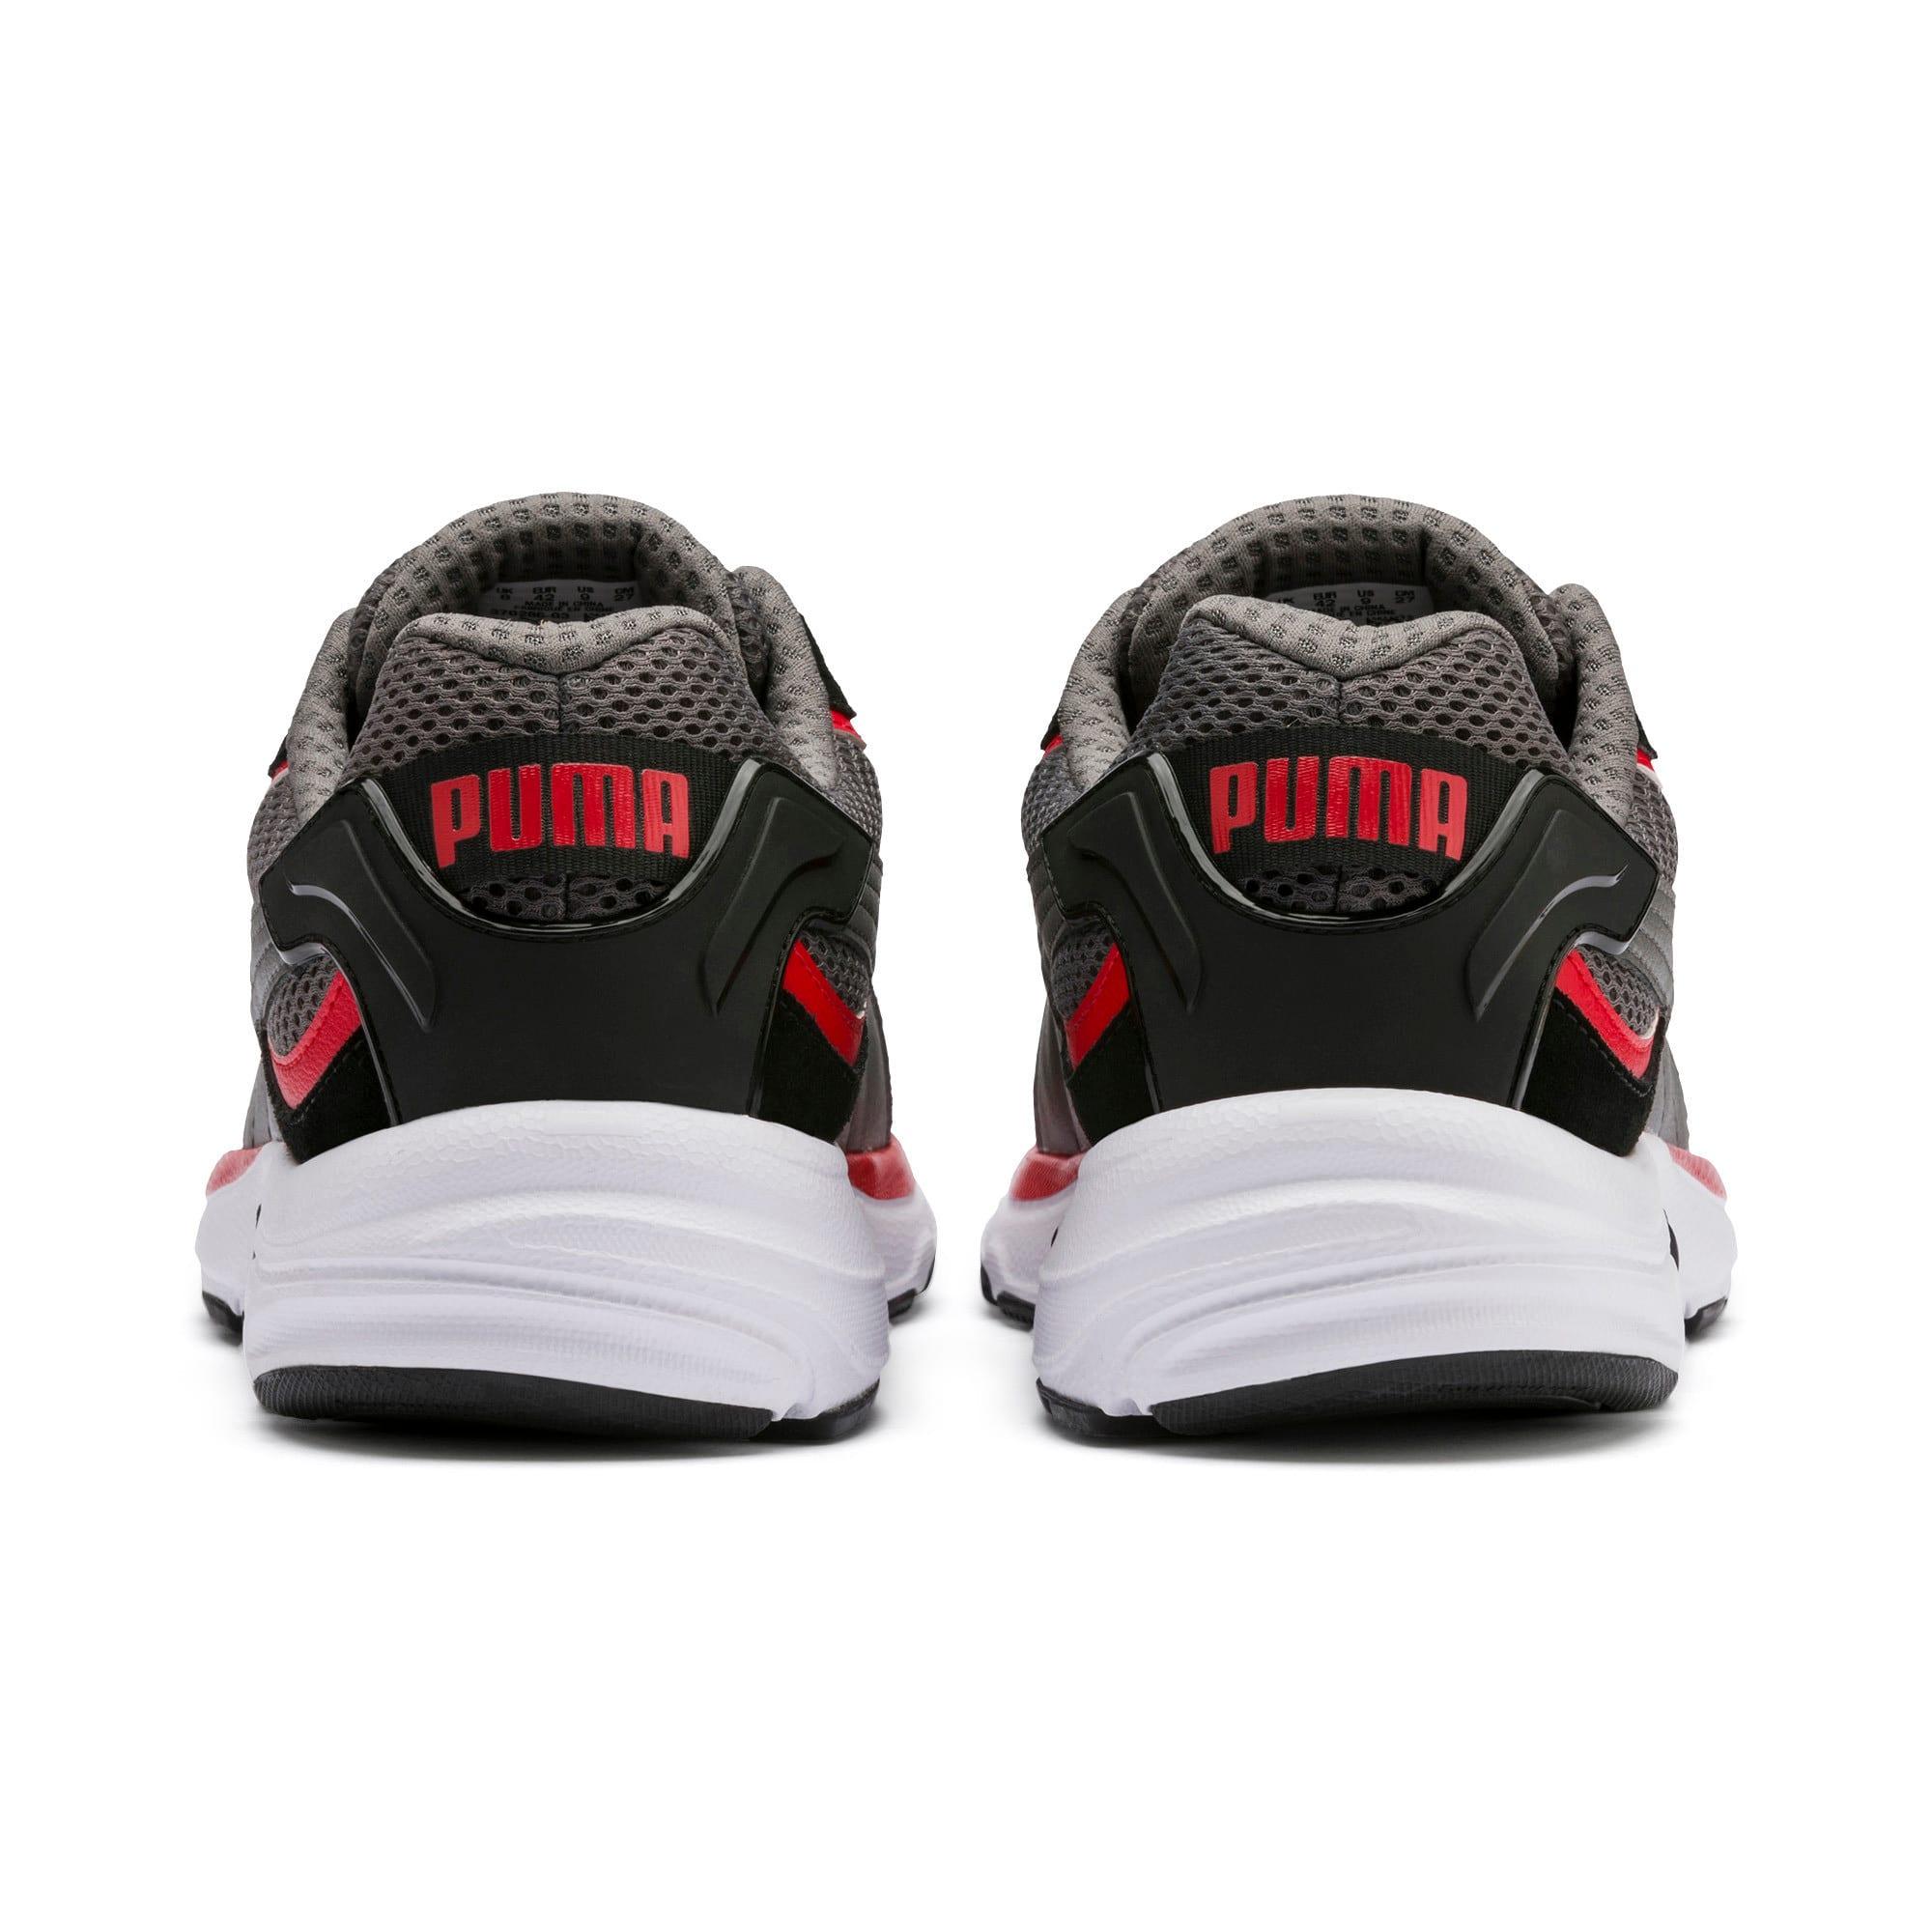 Thumbnail 4 of Axis Plus SD sneakers, CASTLEROCK-Black-Red-White, medium